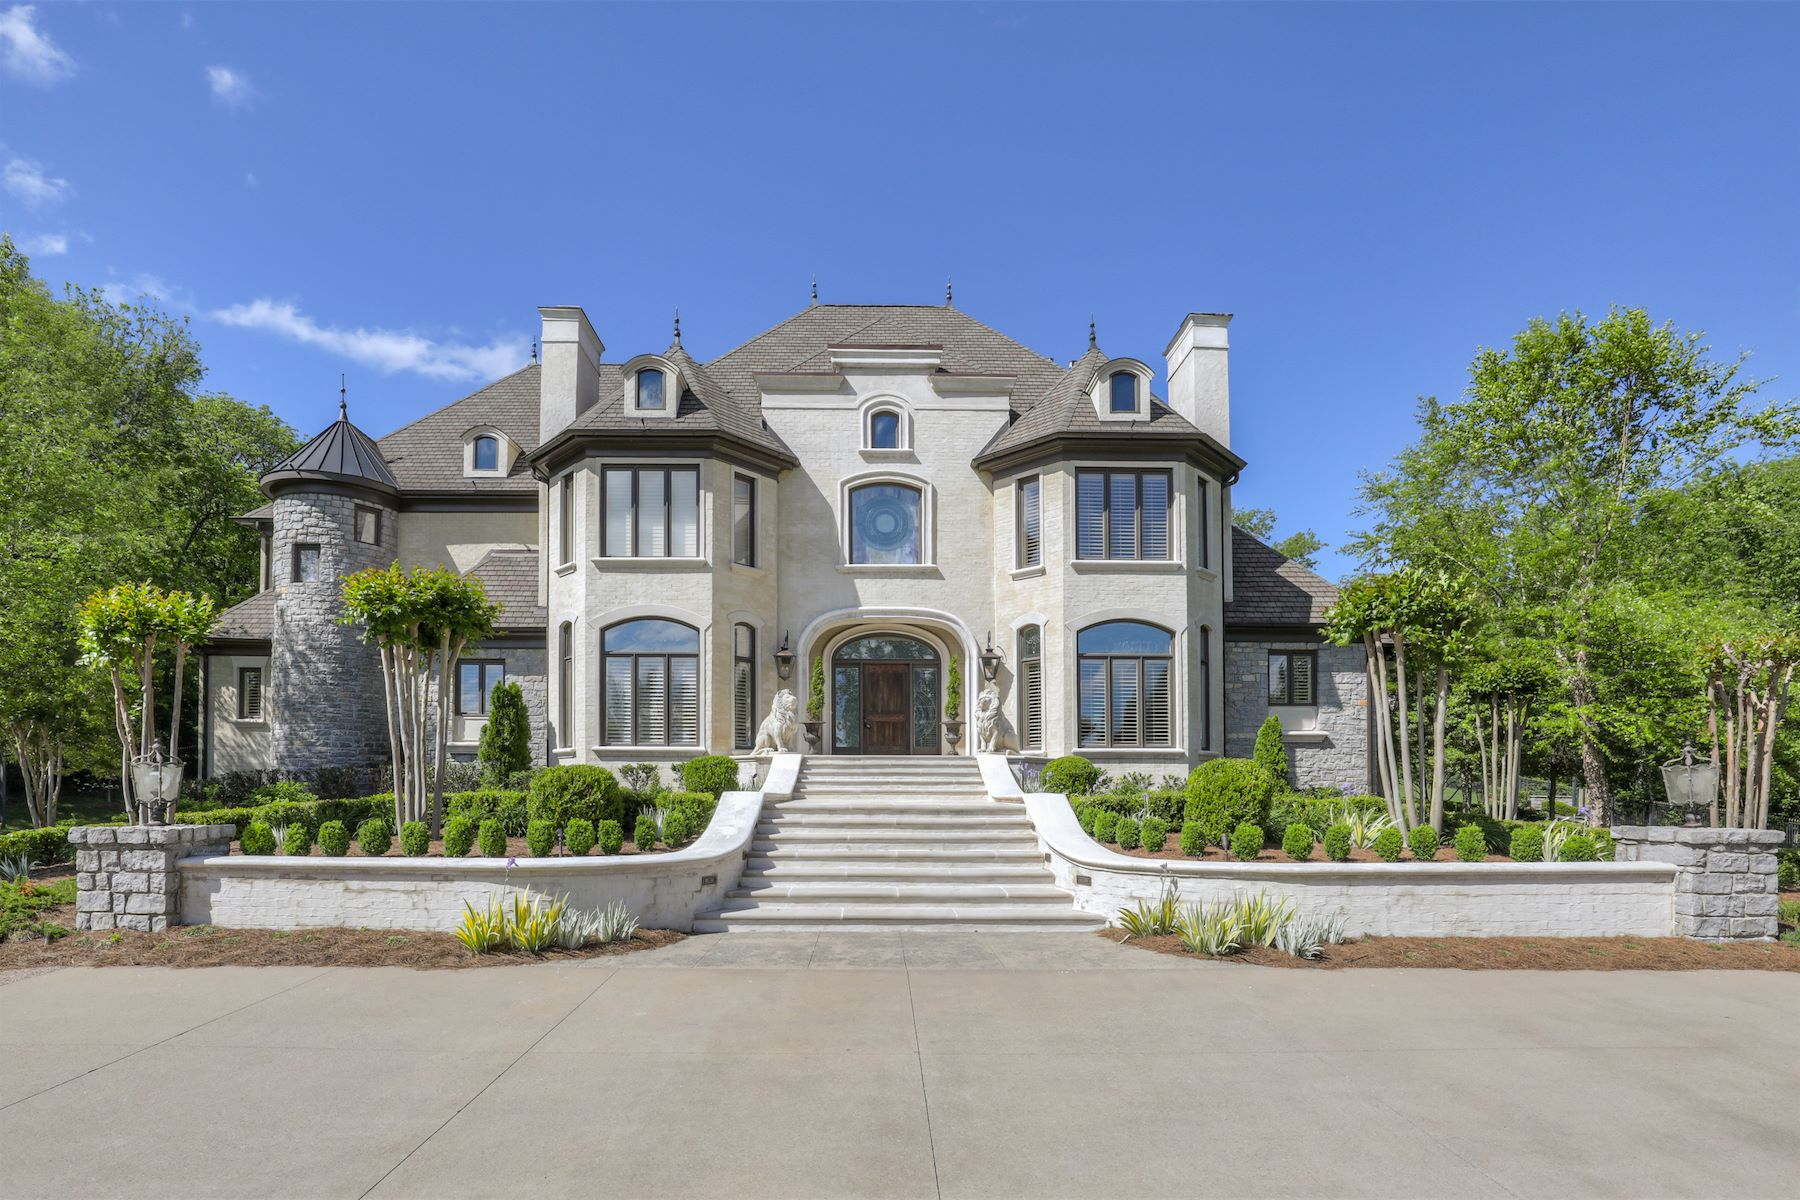 独户住宅 为 销售 在 Breathtaking Forest Hills Estate 1224 Otter Creek Road 那什维尔, 田纳西州 37215 美国